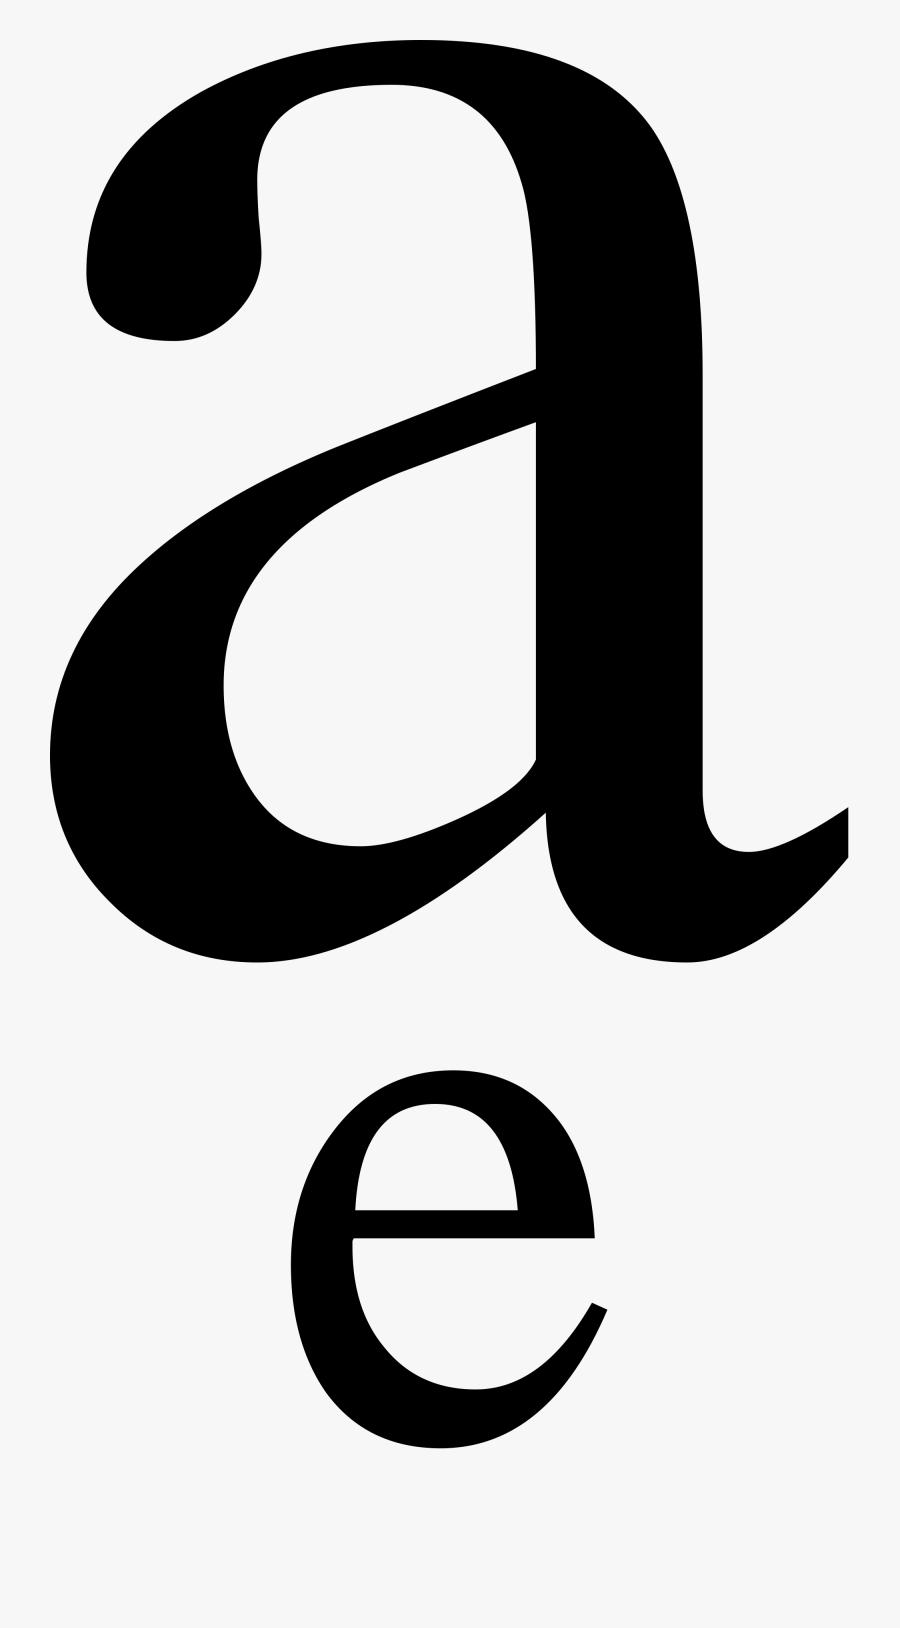 19 Alpha Vector Greek Letter Huge Freebie Download - Small A Letter Style, Transparent Clipart